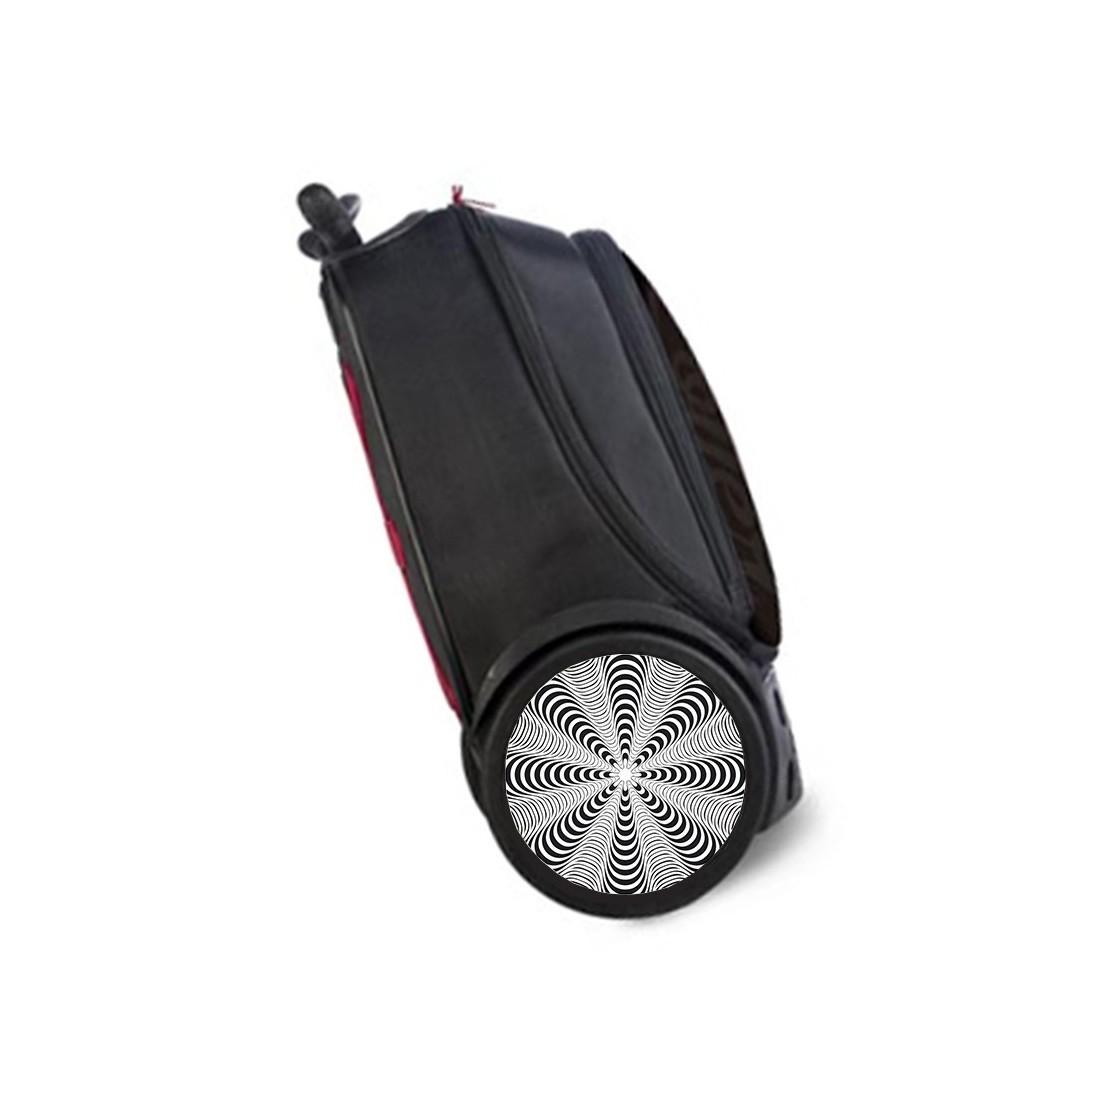 Naklejki na kółka Roller Dizzy - plecak-tornister.pl